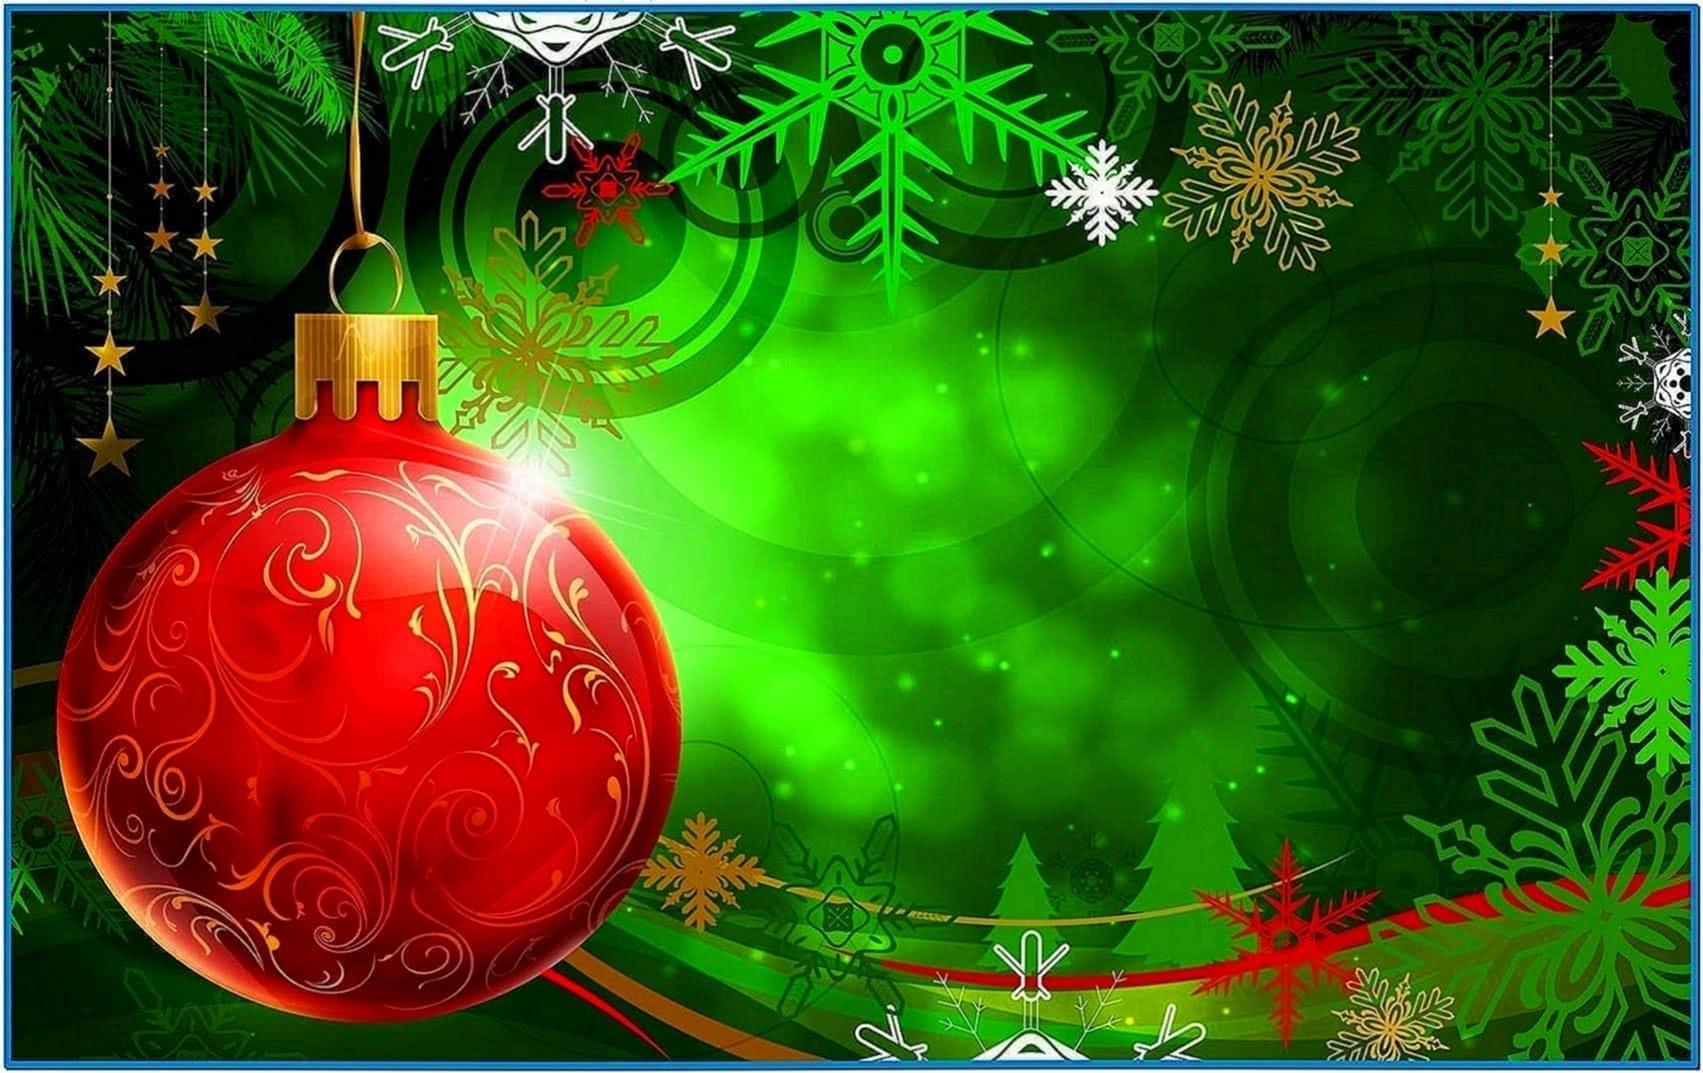 Christmas Bulletin Boards Free Xmas Wallpaper Screensavers 2017